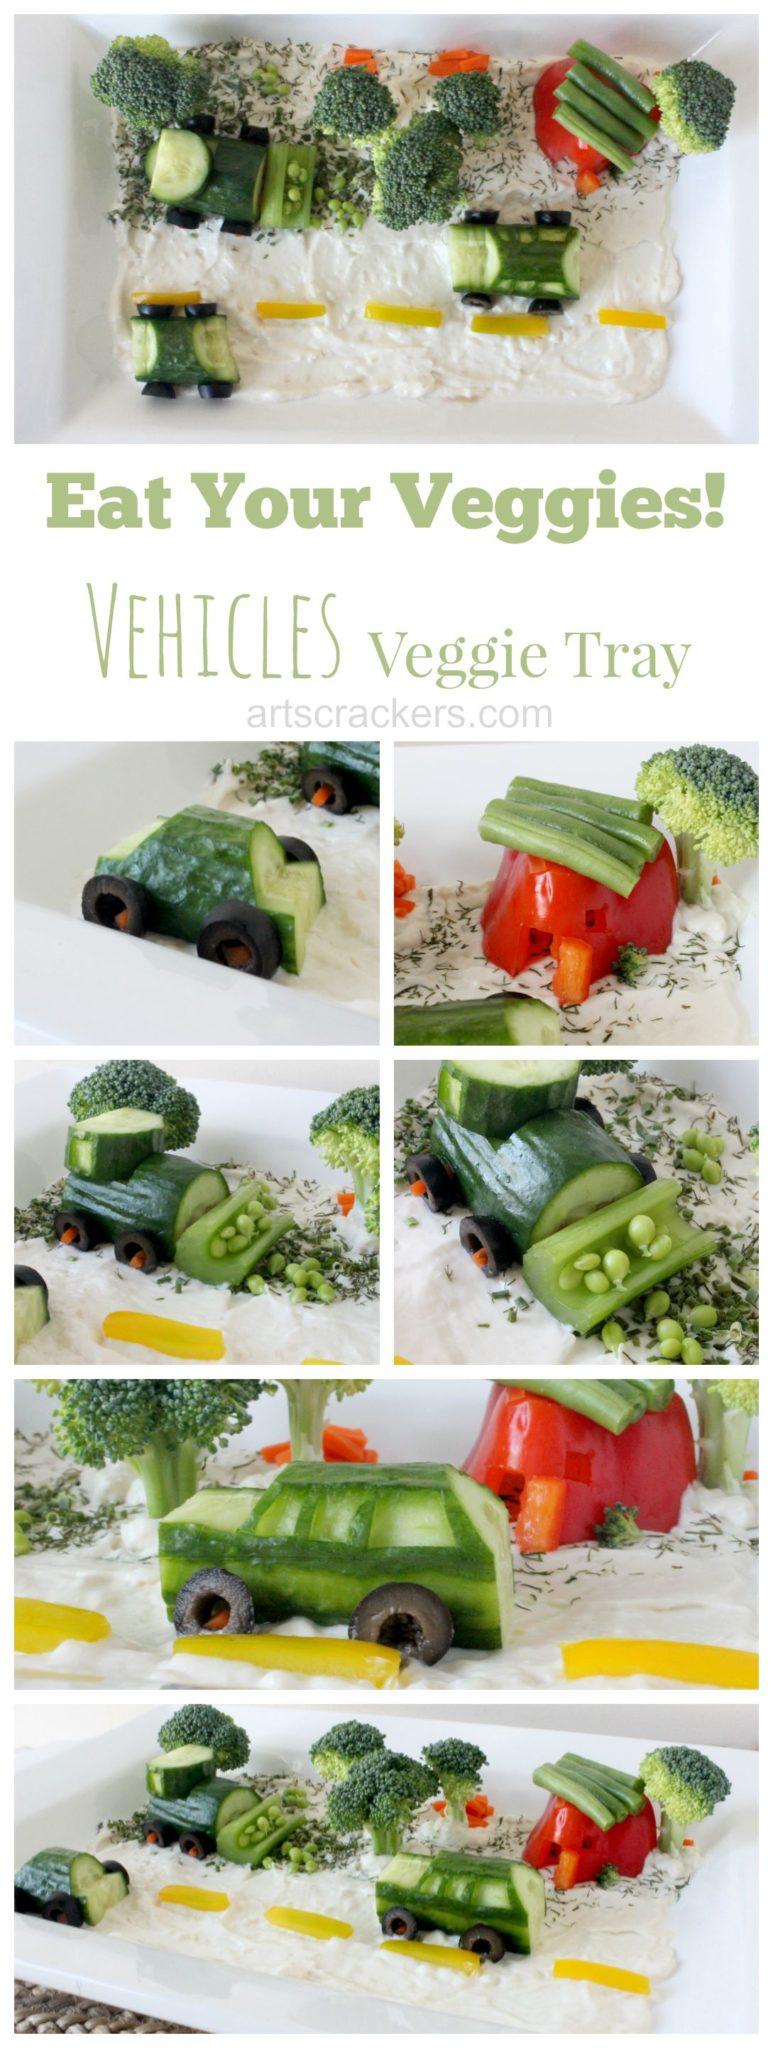 Eat Your Veggies Vehicles Vegetable Tray Tutorial